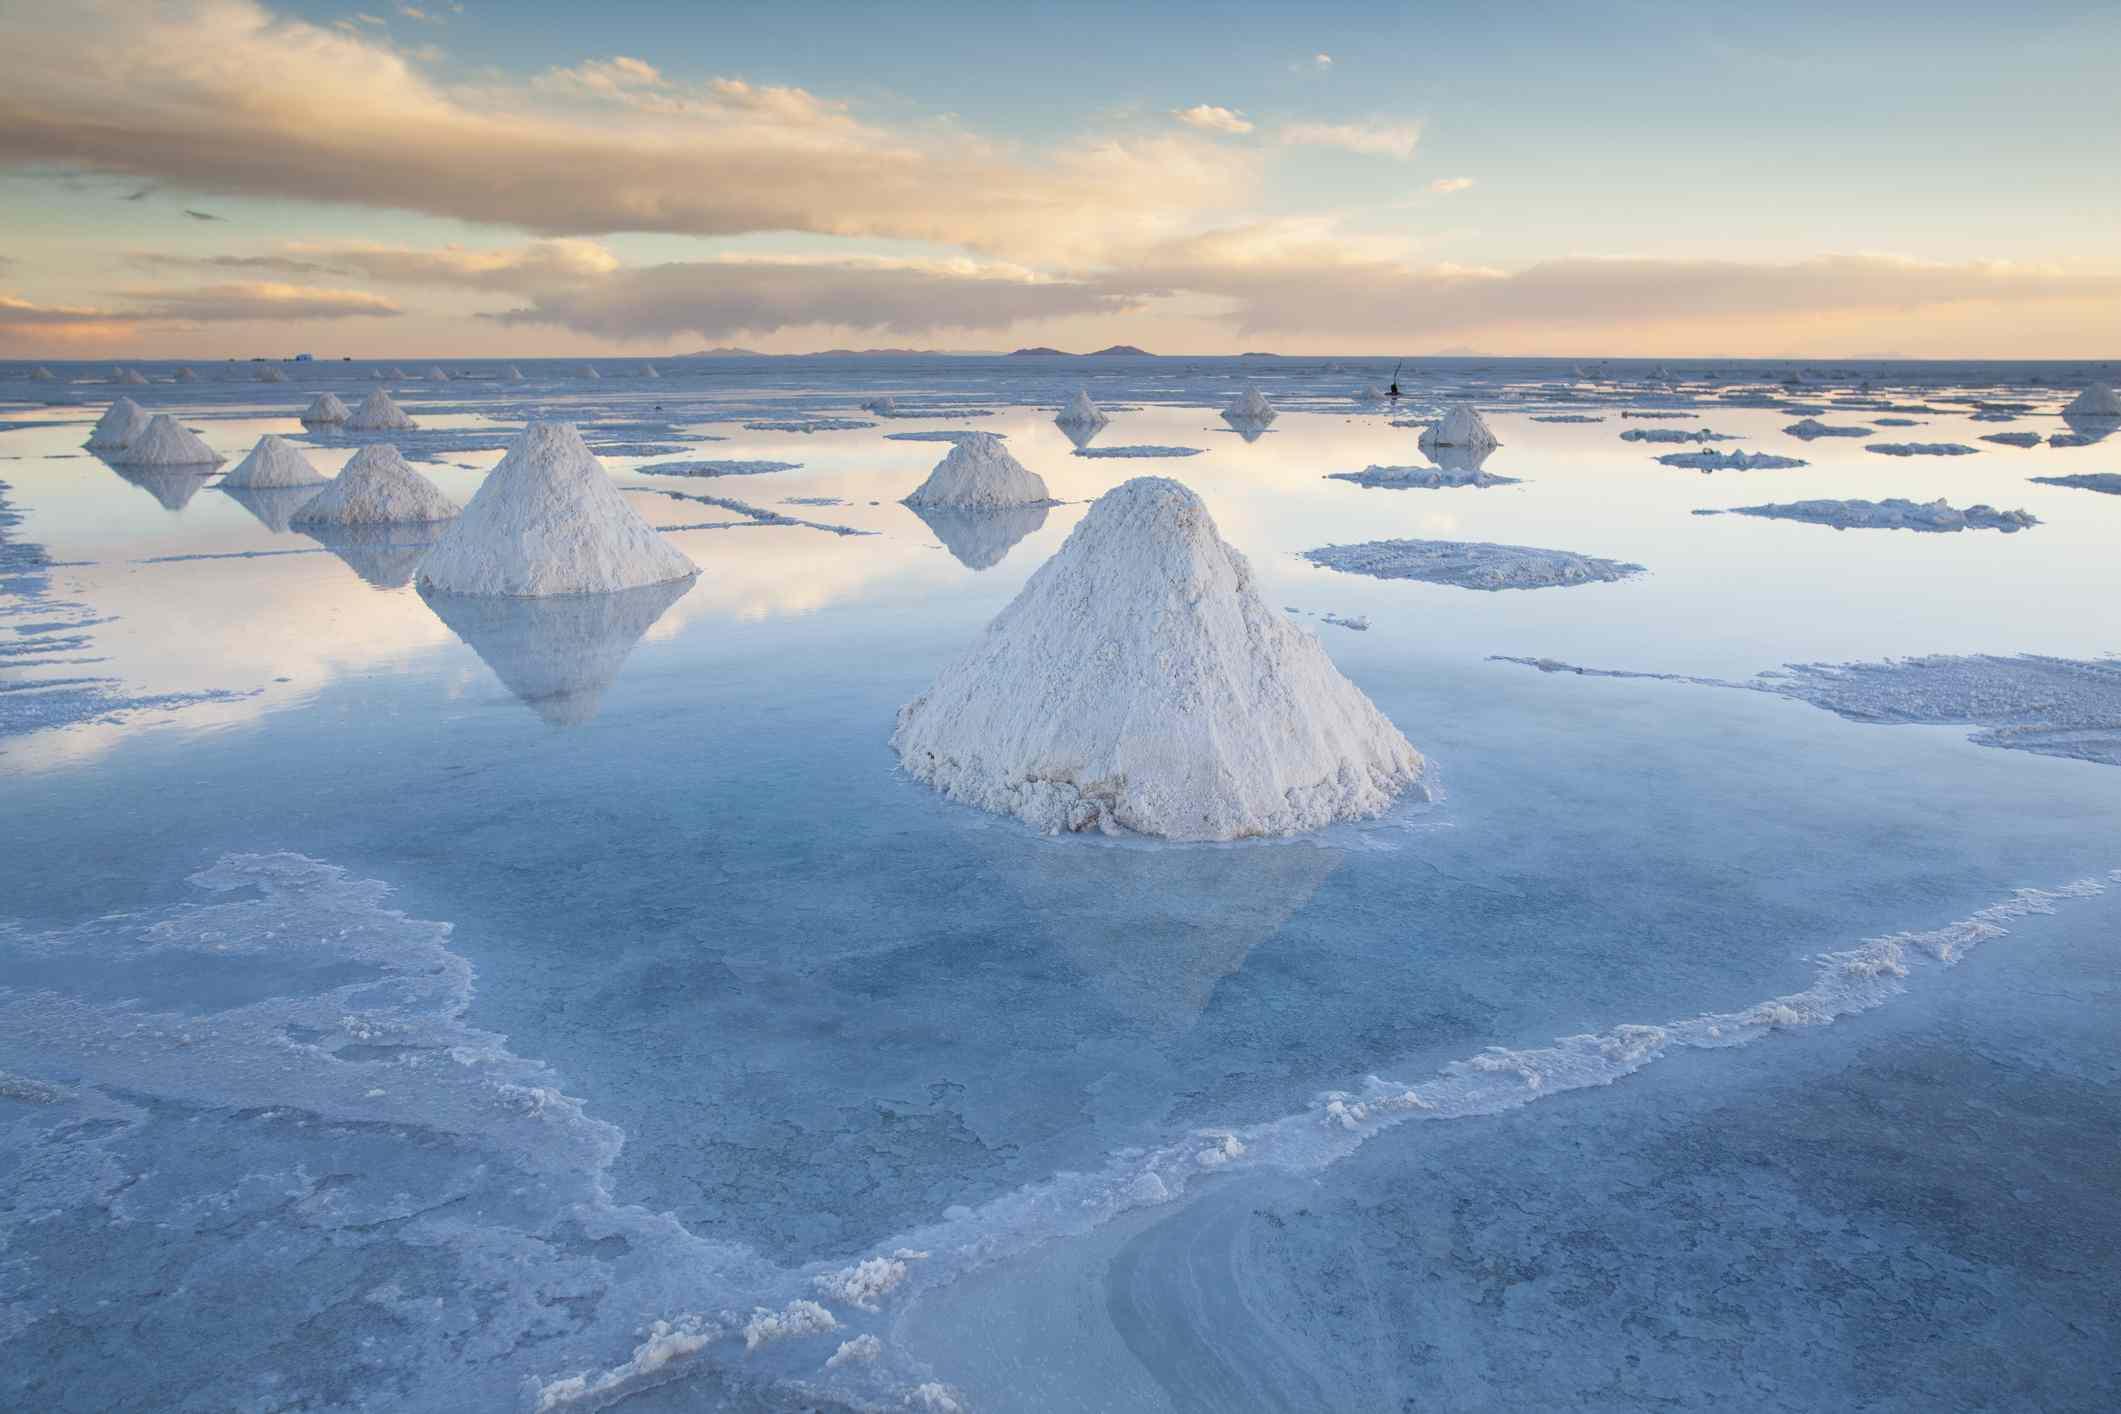 Salt on the plains of Salar de Uyuni, Bolivia